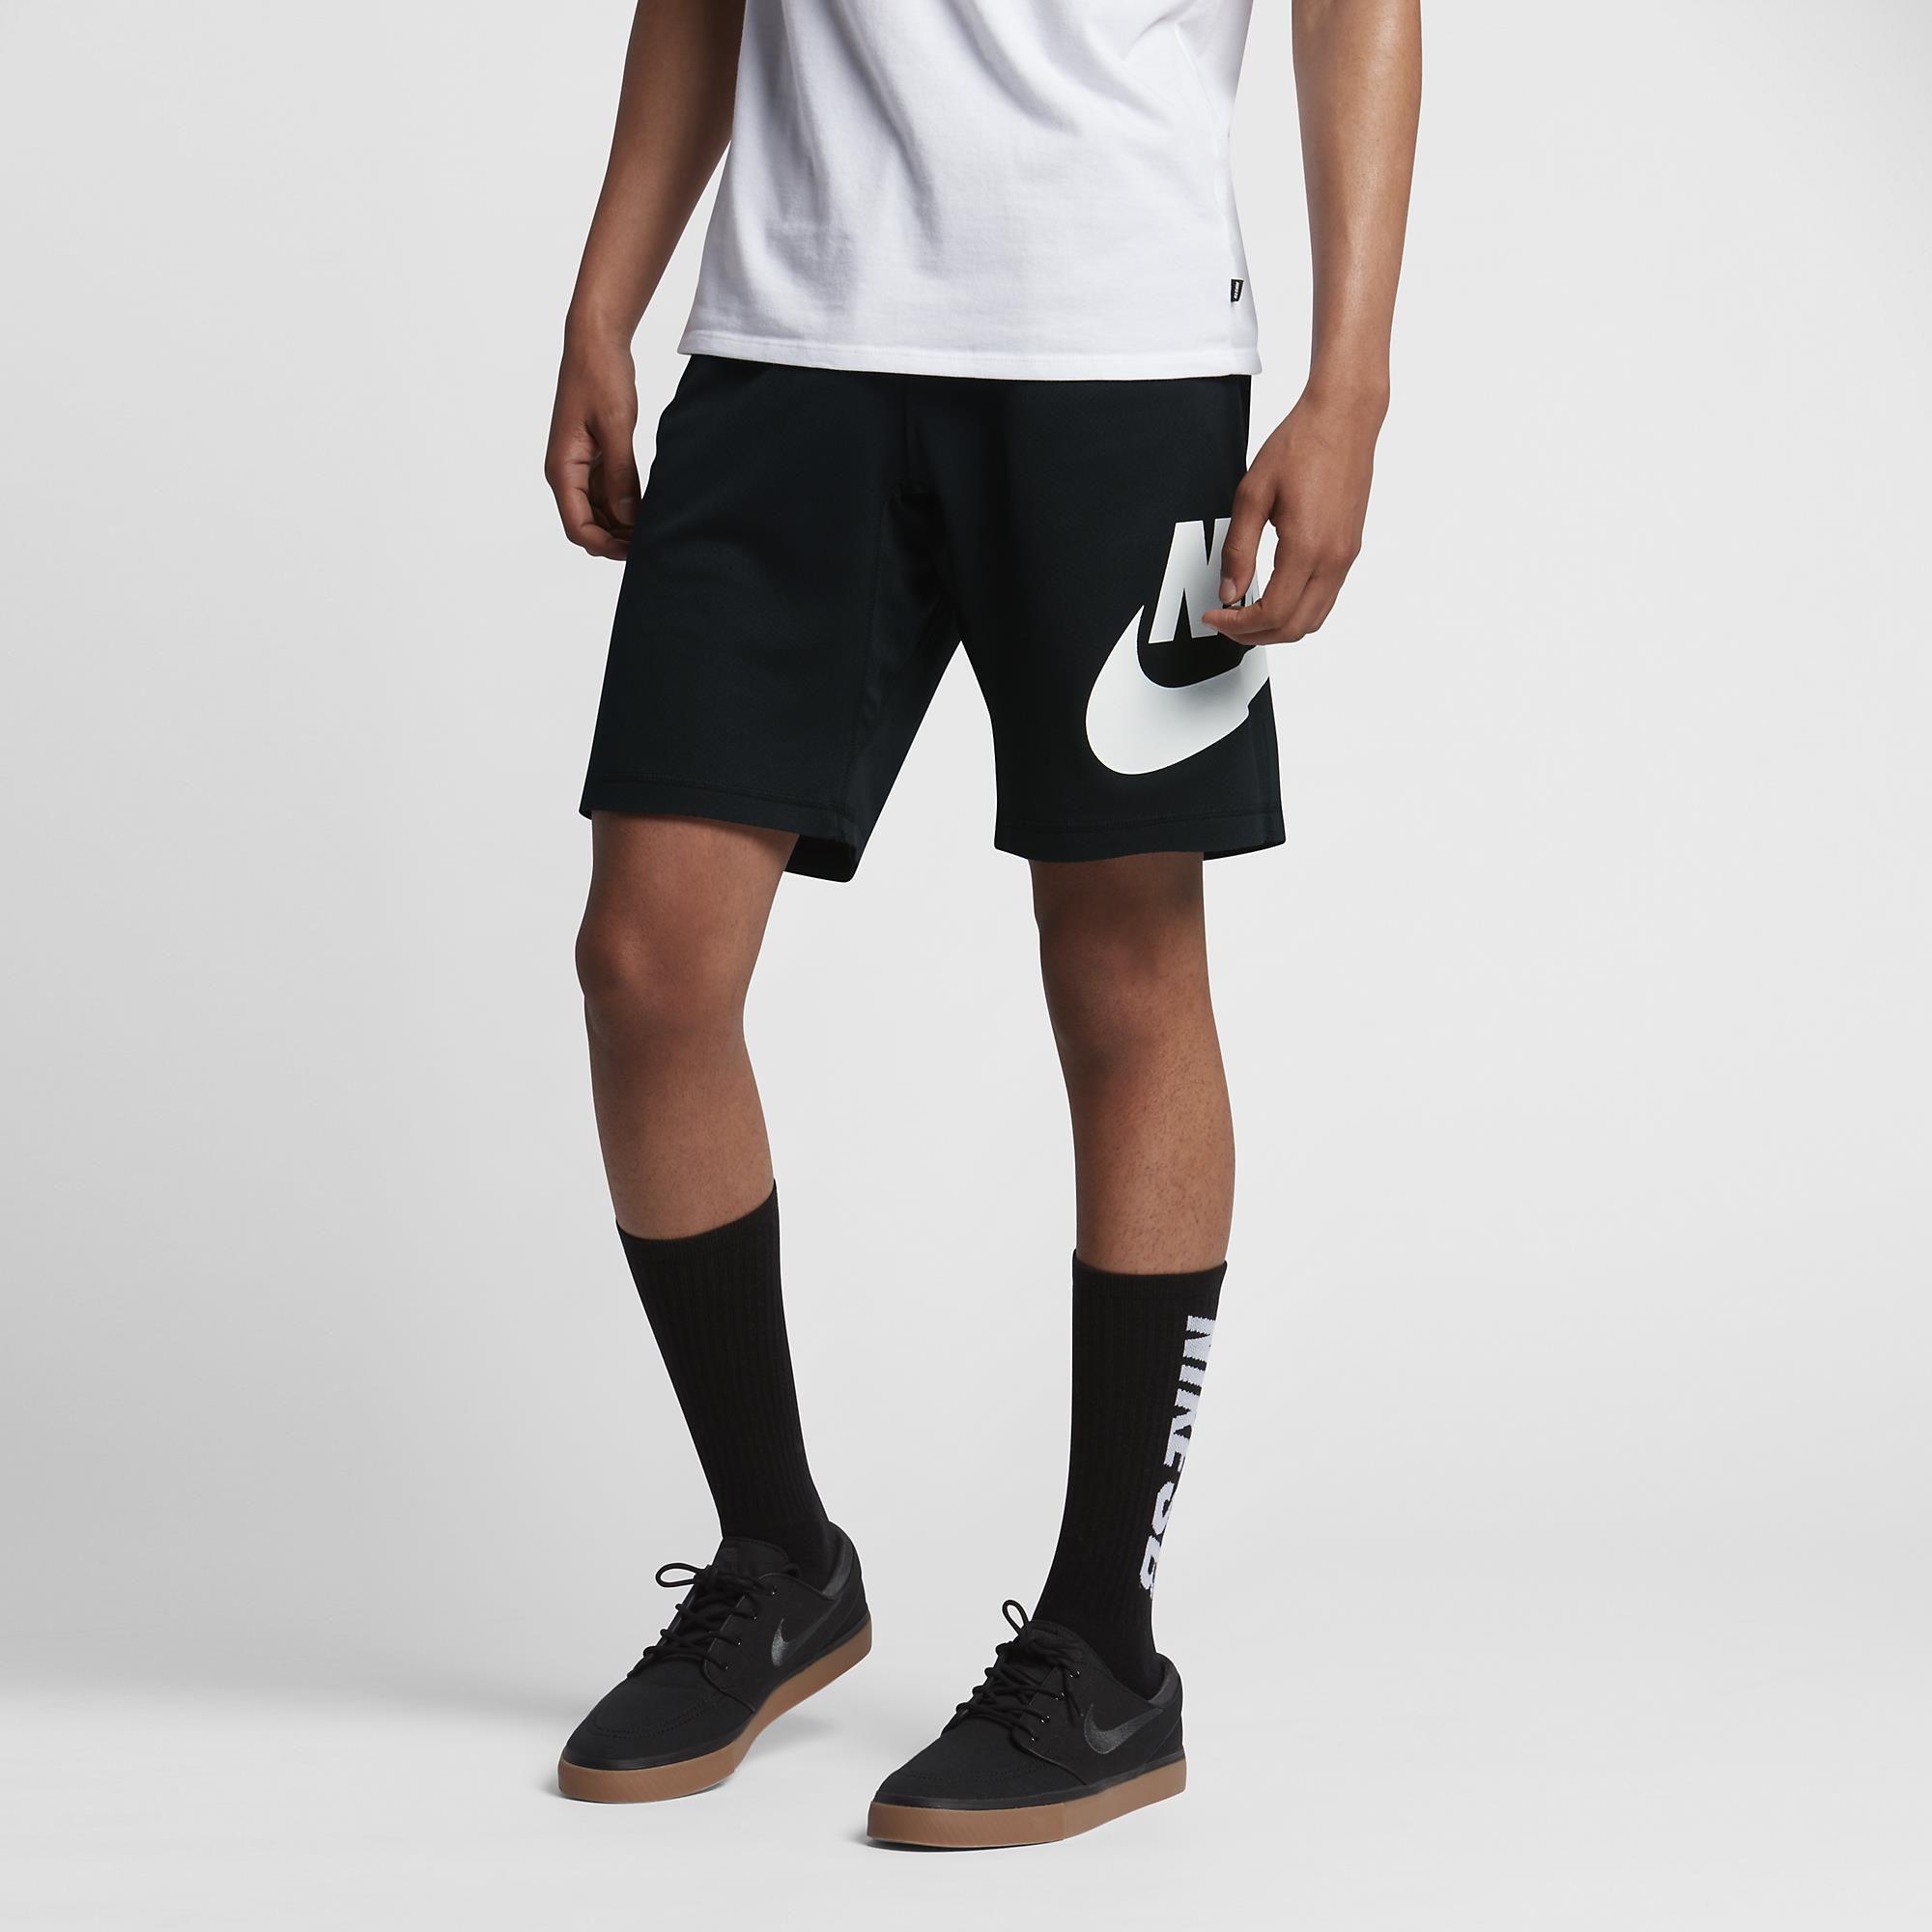 Bermuda Masculina Nike Sunday - BRACIA SHOP  Loja de Roupas ... 0940a36dd2901